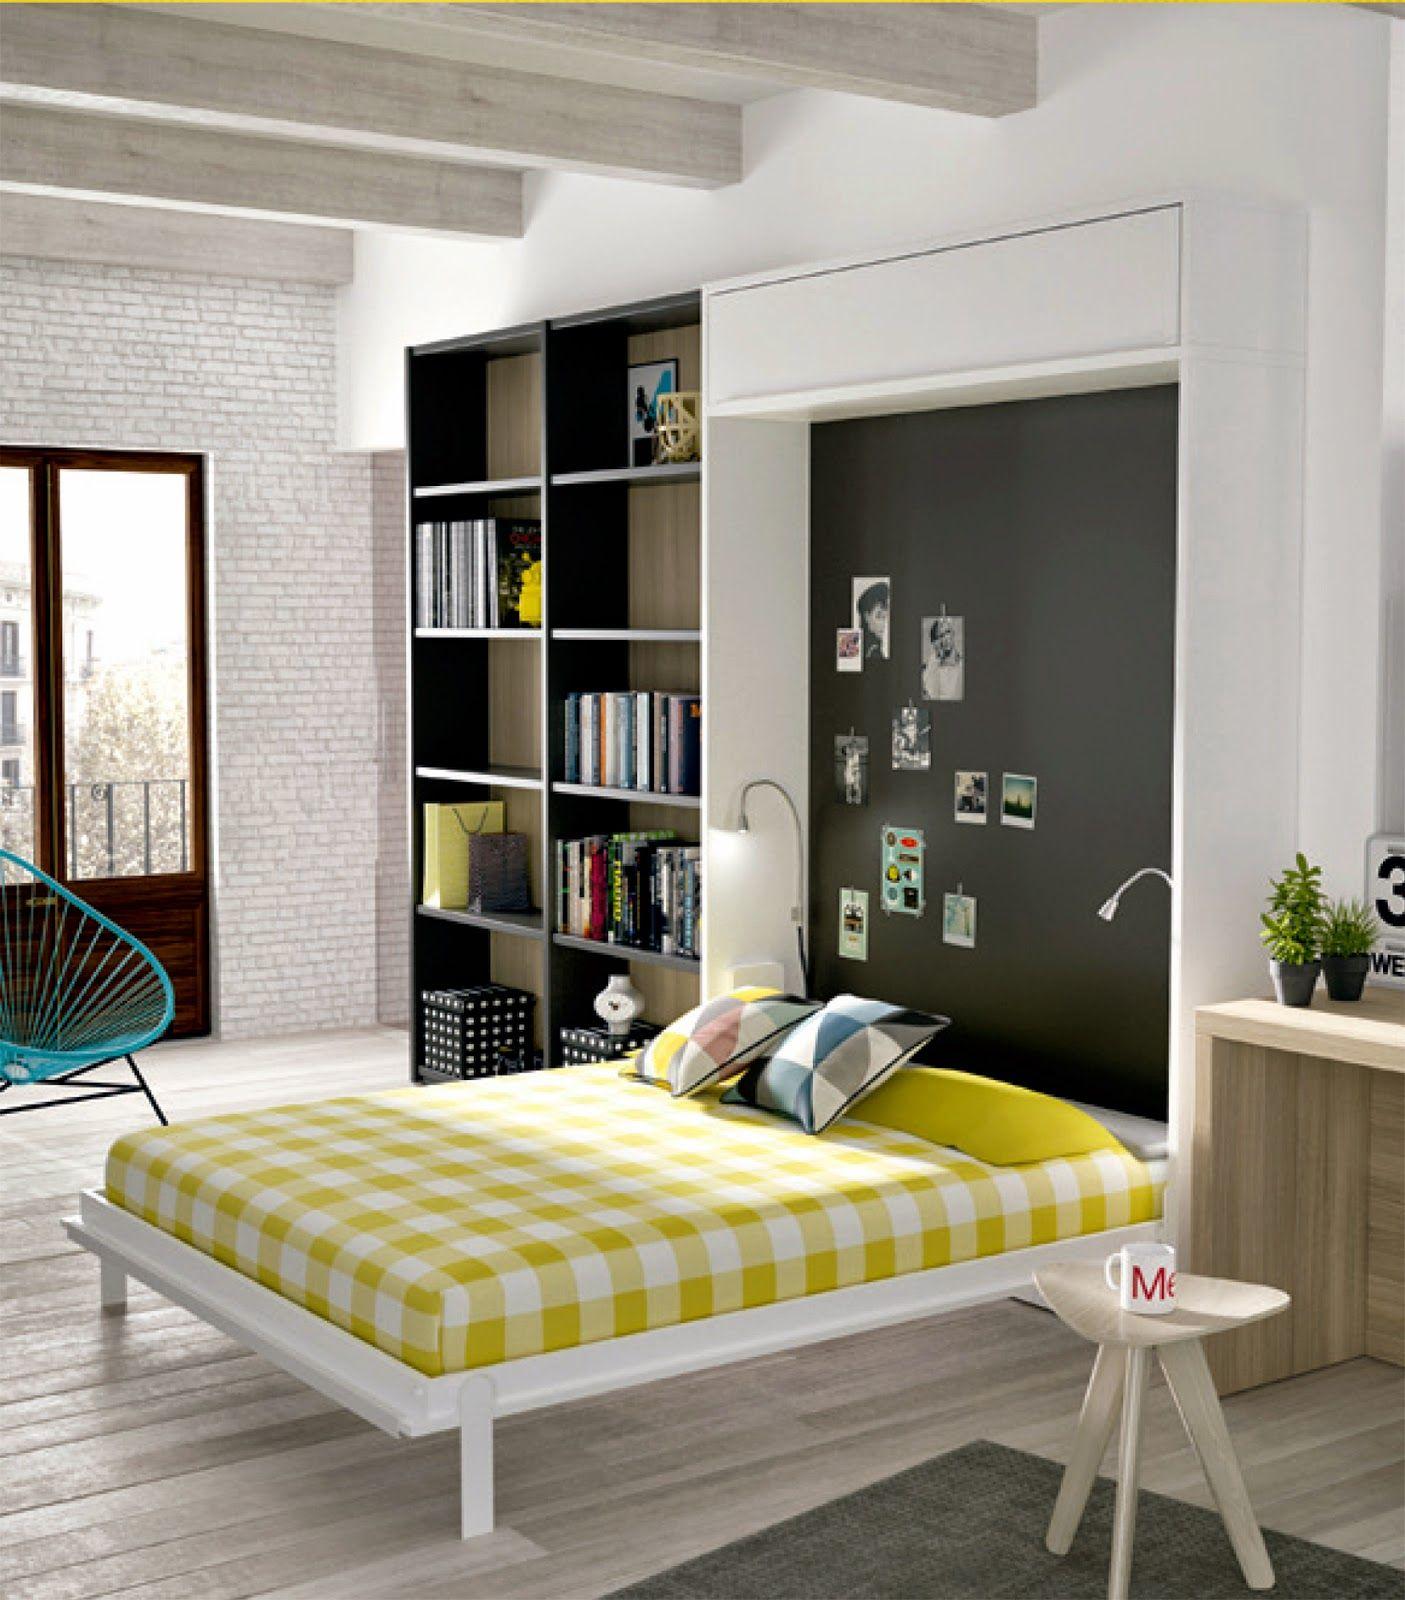 Cama de matrimonio abatible vertical apartament - Fabricar cama abatible ...